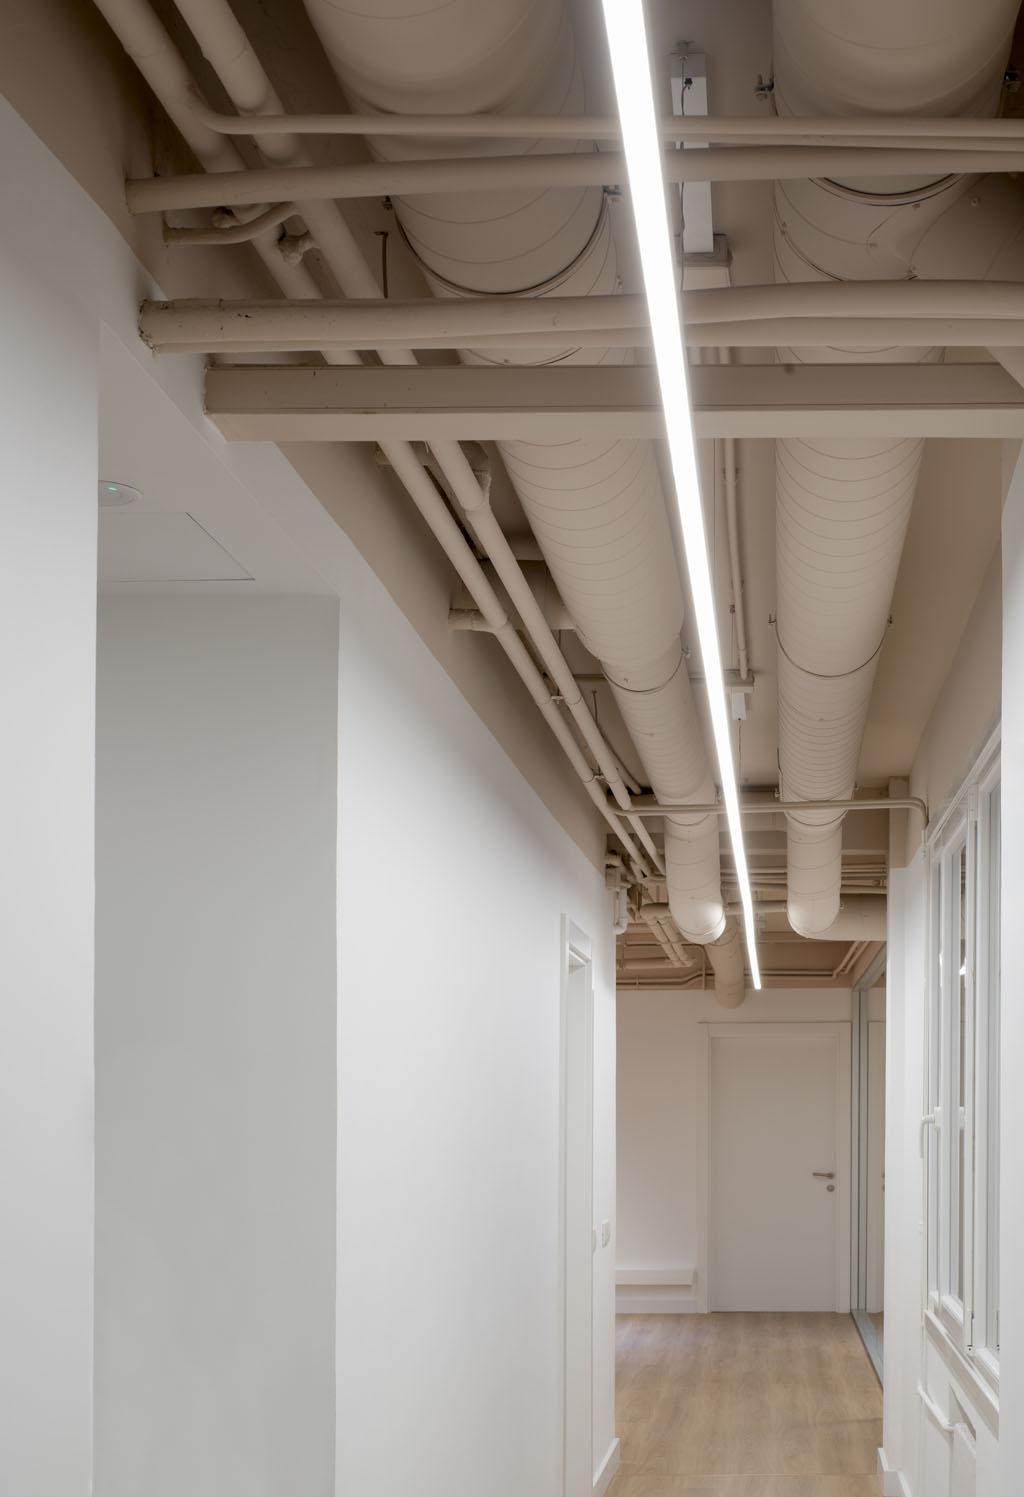 LANBIDE_WEB_015-Erlantz Biderbost fotografo de arquitectura e interiores